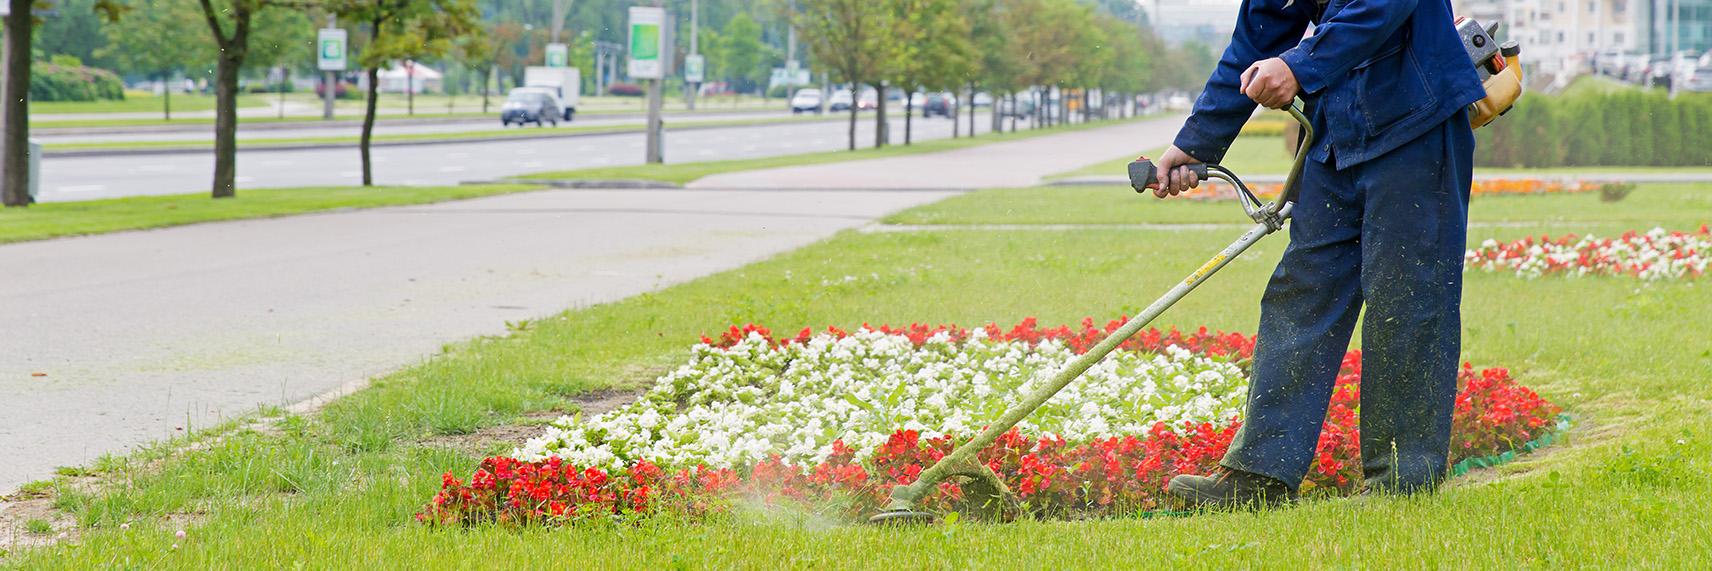 Orlando Commercial Landscape Design Services Landscape Contractors Orlando